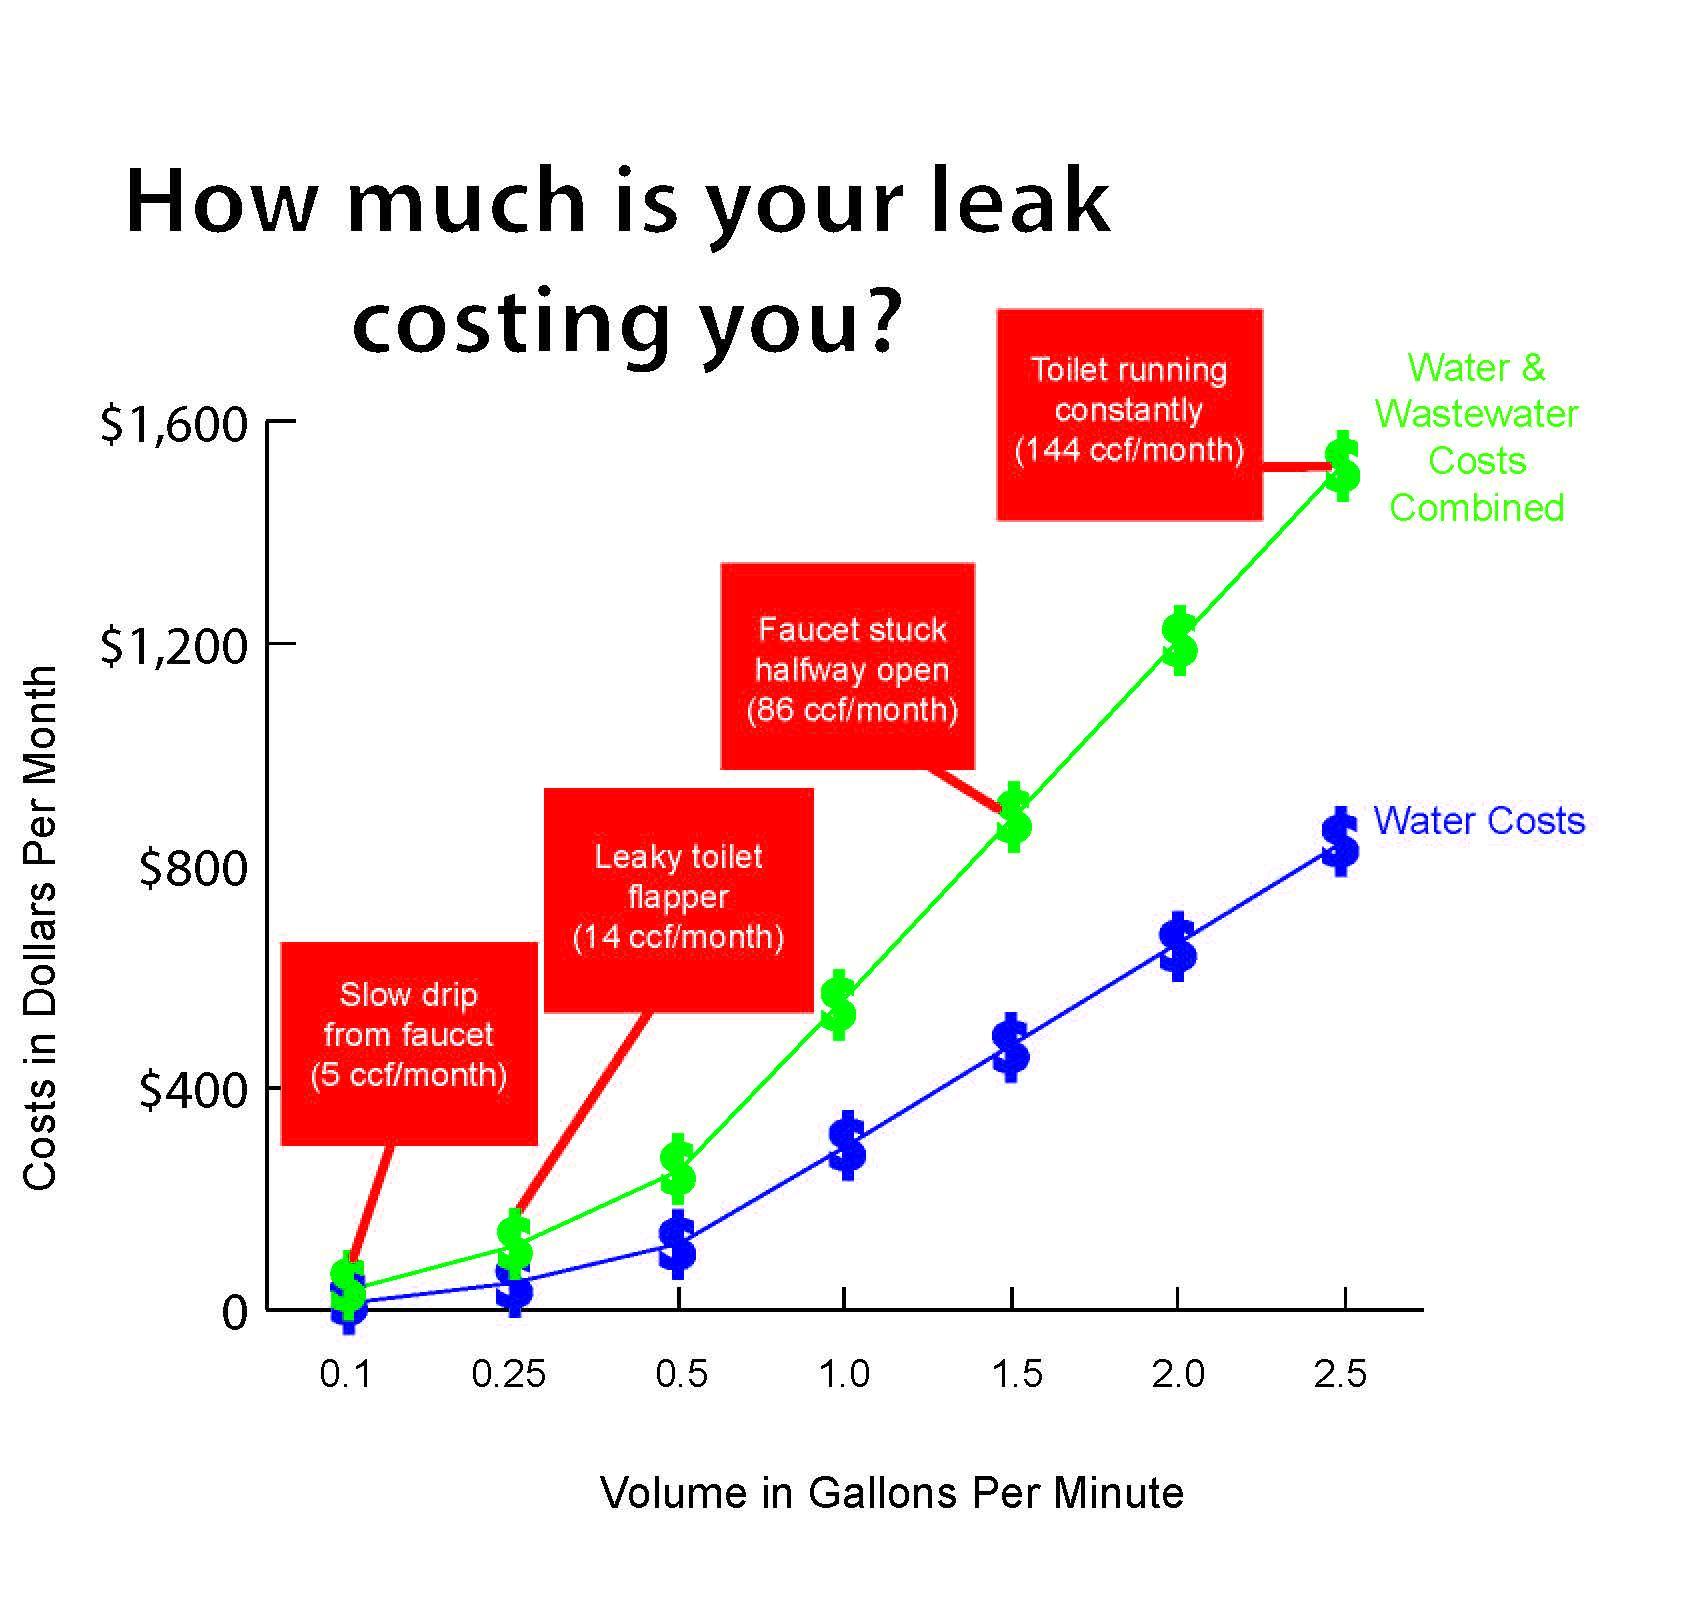 Plumbing Leaks Diagram root cause fishbone diagram template Wire ...